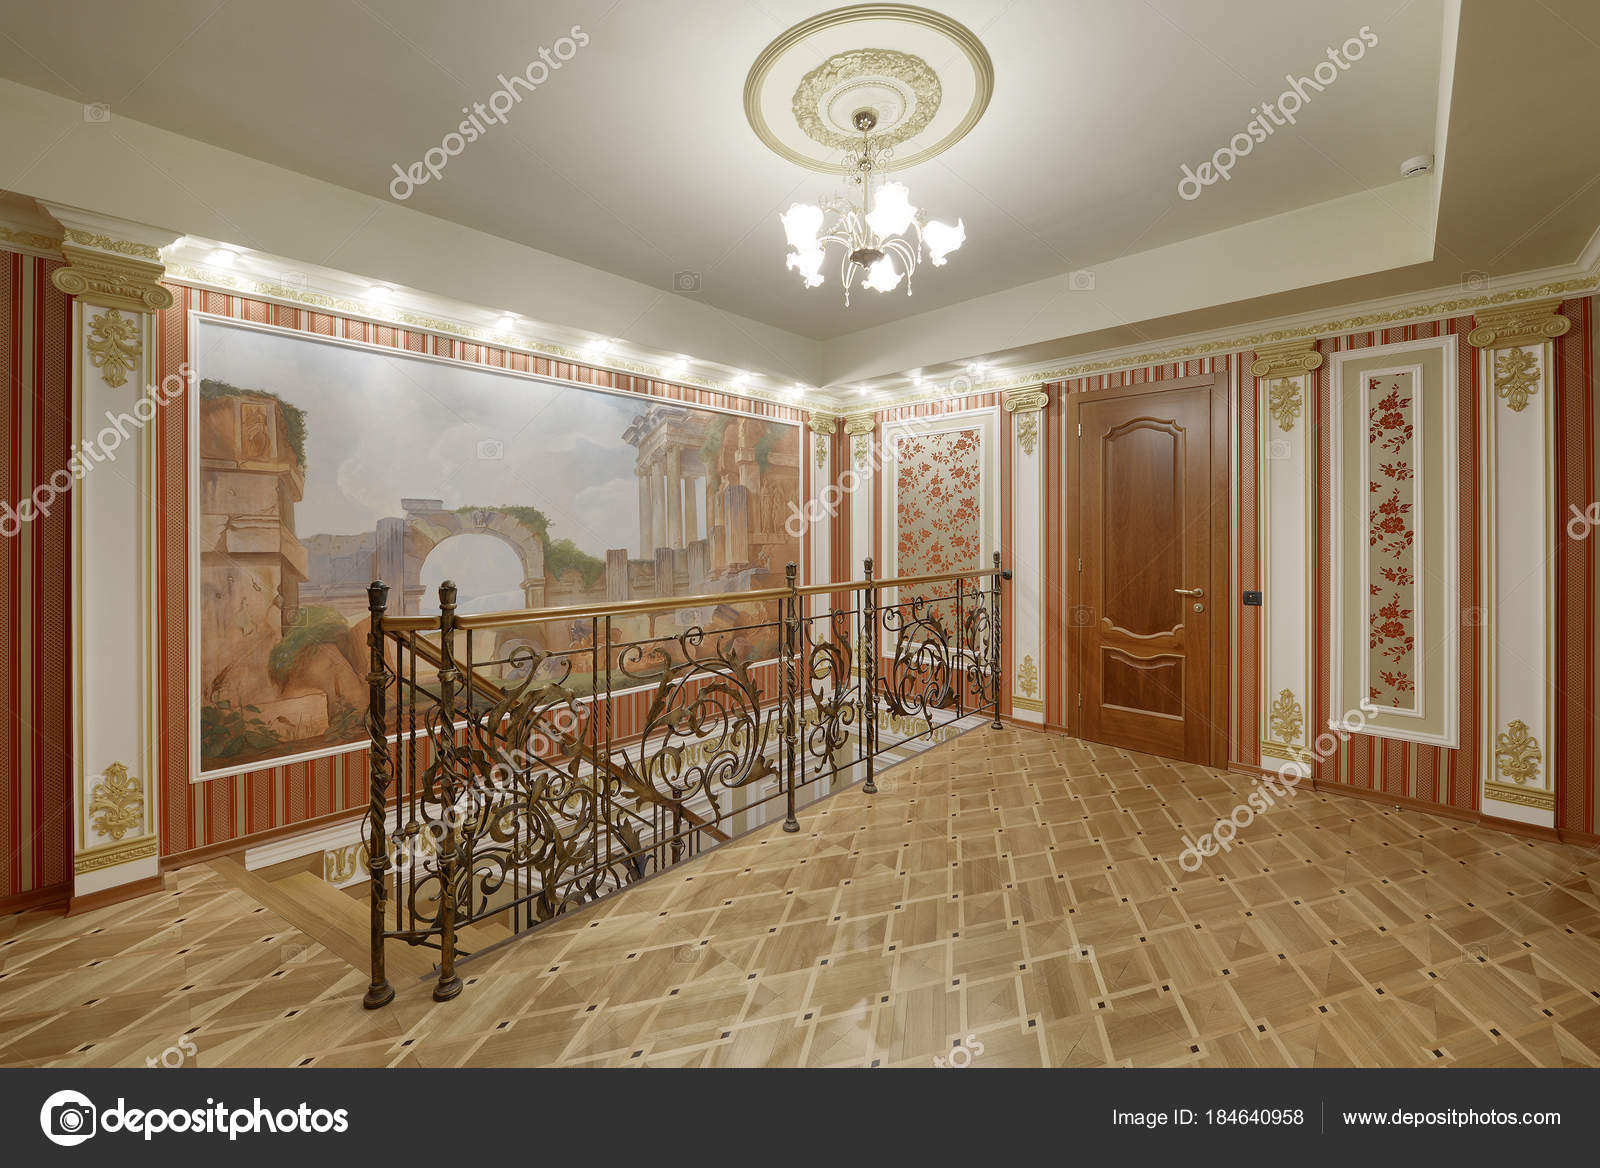 Diseno Escaleras Interior Casa Fotos De Stock C Ovchinnikovfoto - Diseo-escaleras-interiores